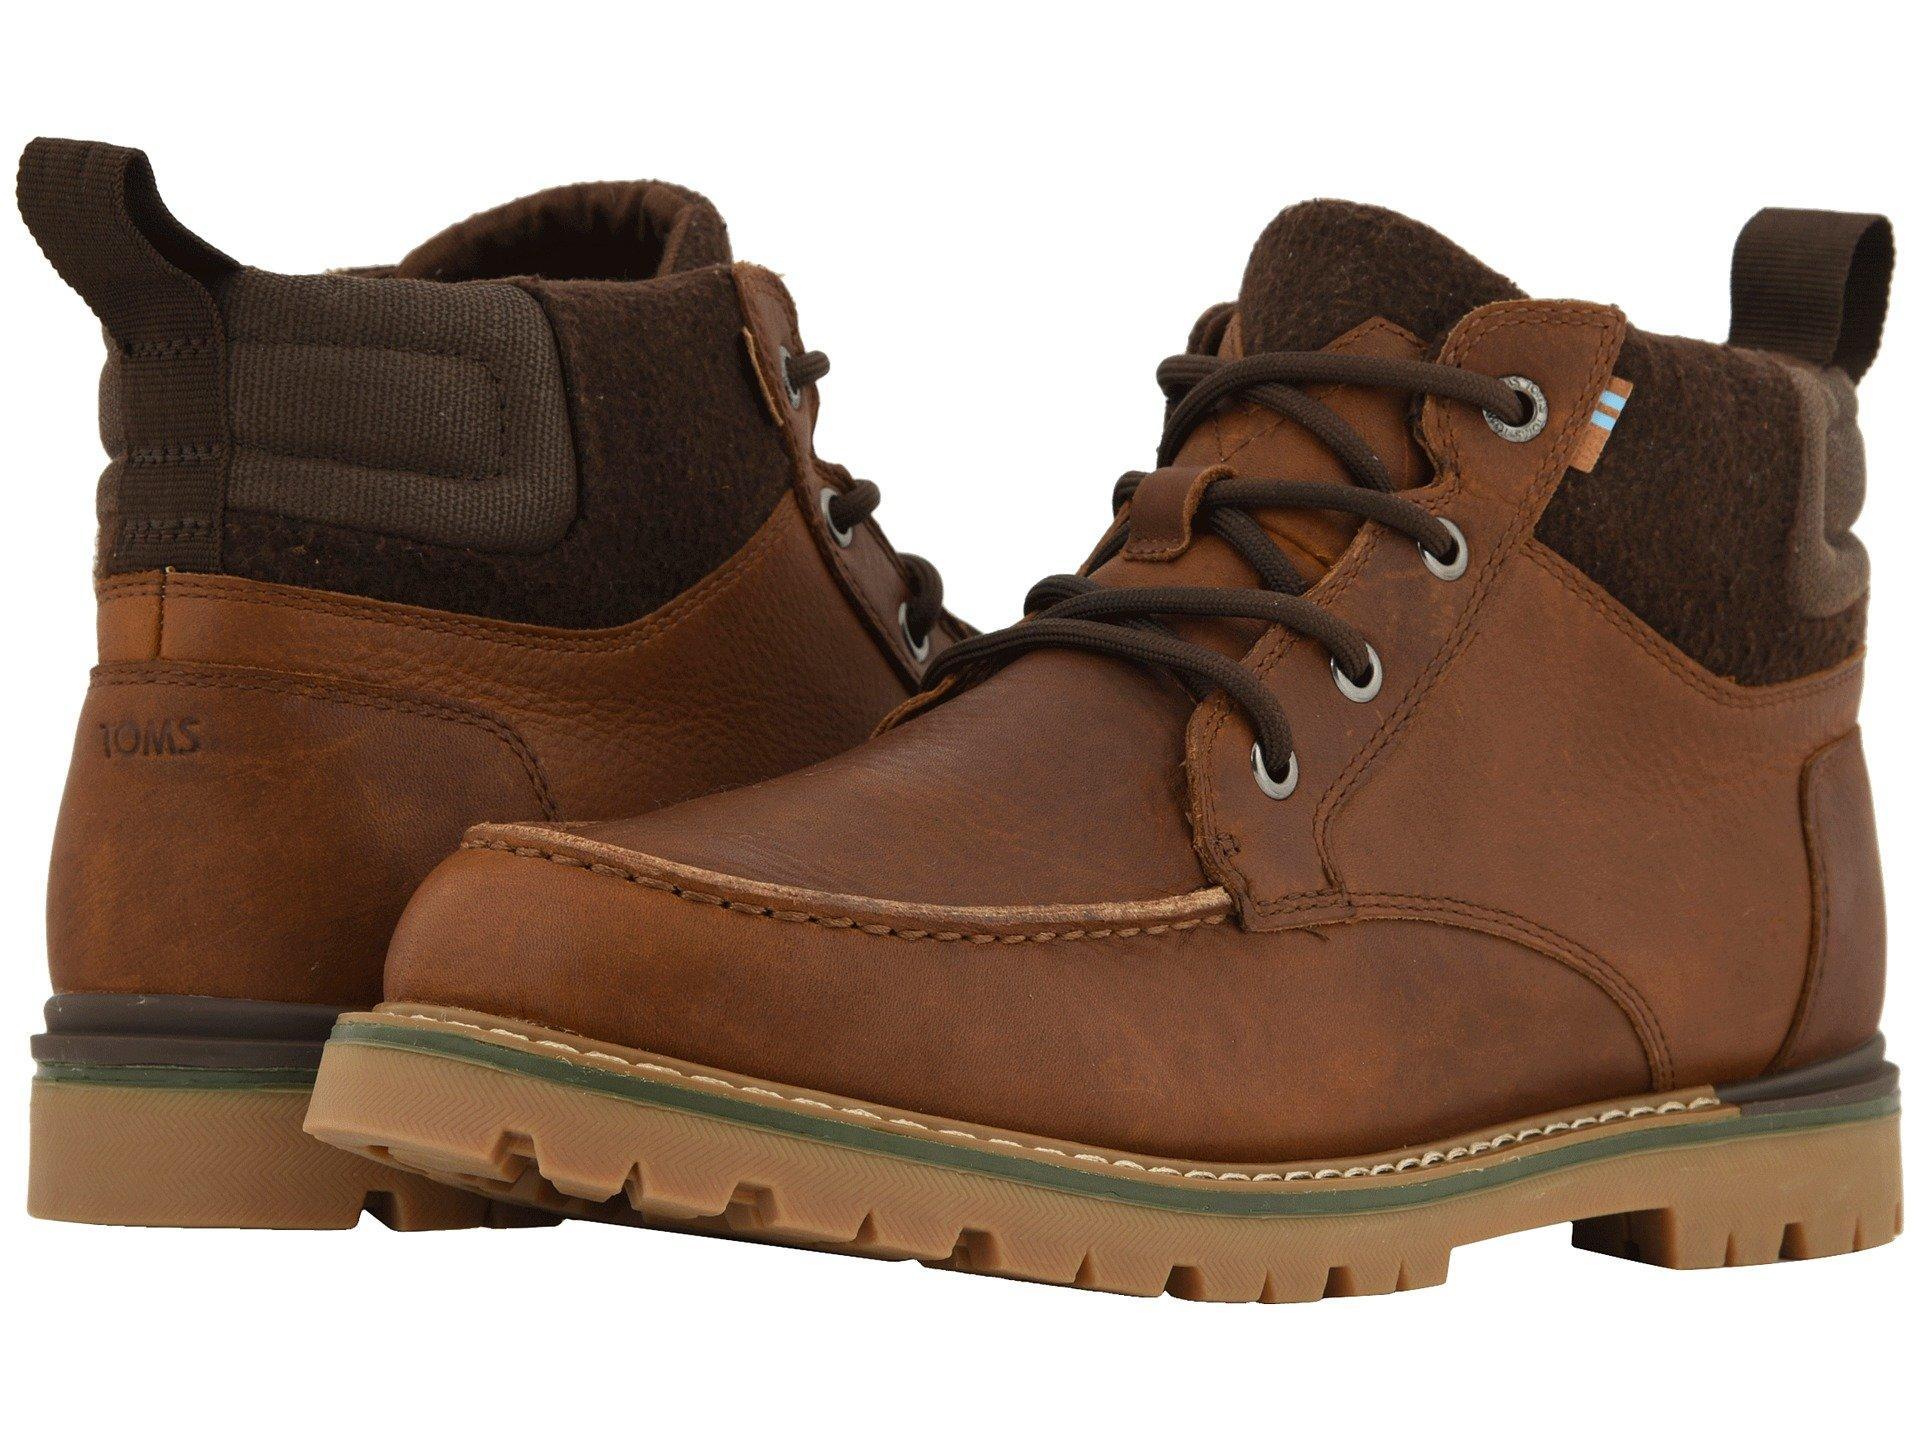 86f9485999f Men's Brown Hawthorne Waterproof Boot